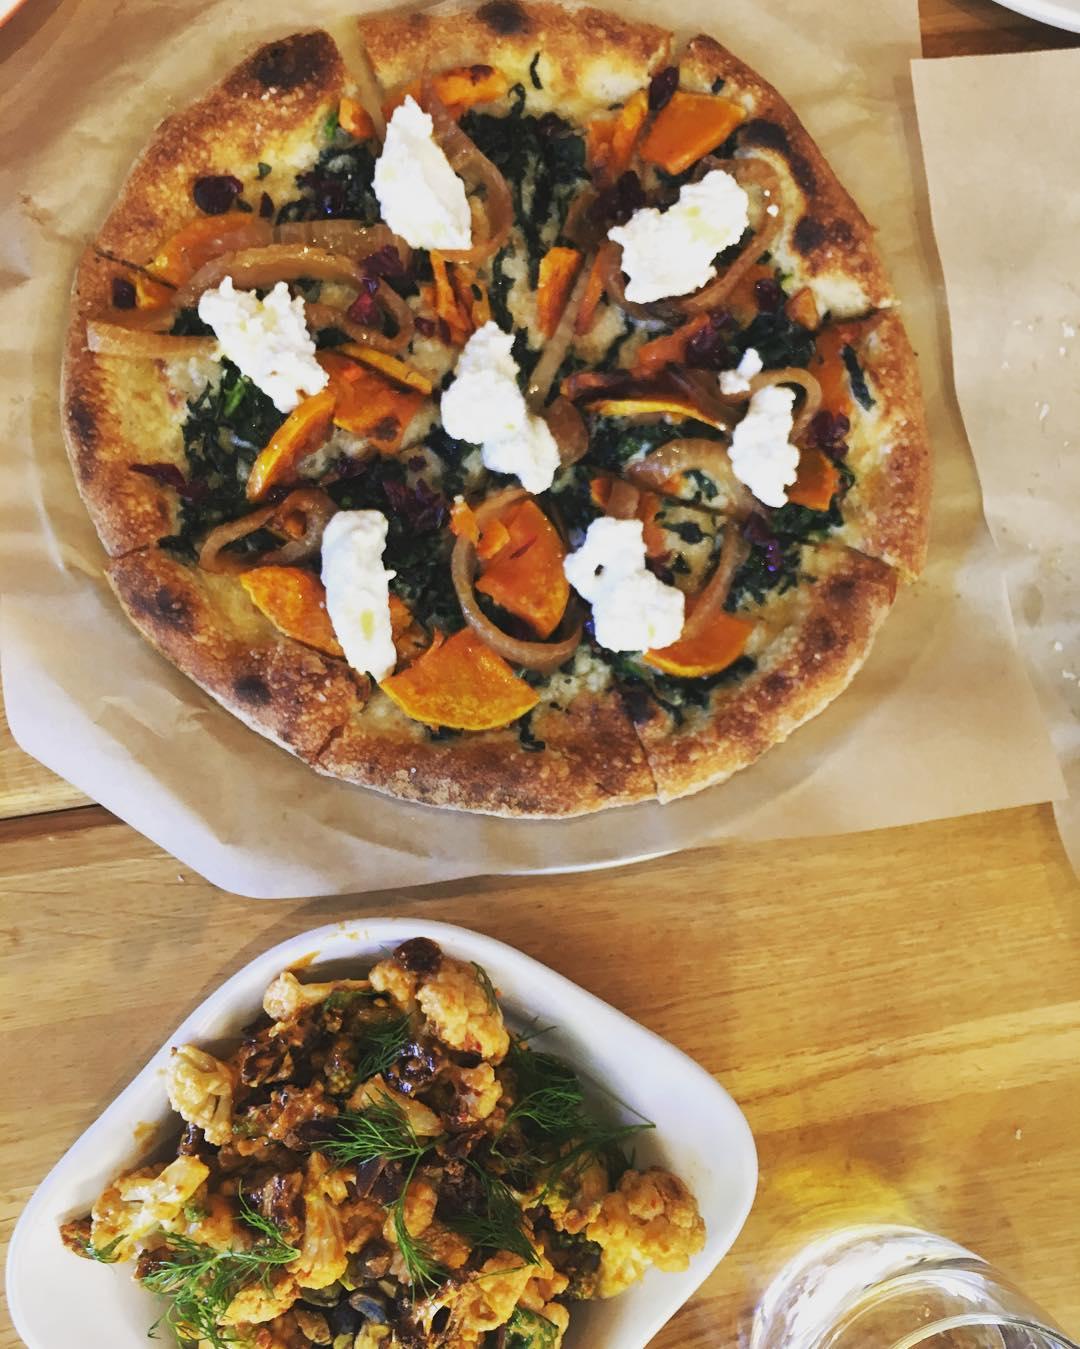 True Food Kitchen Phoenix Az: The Non-Snobby Phoenix Dining Guide